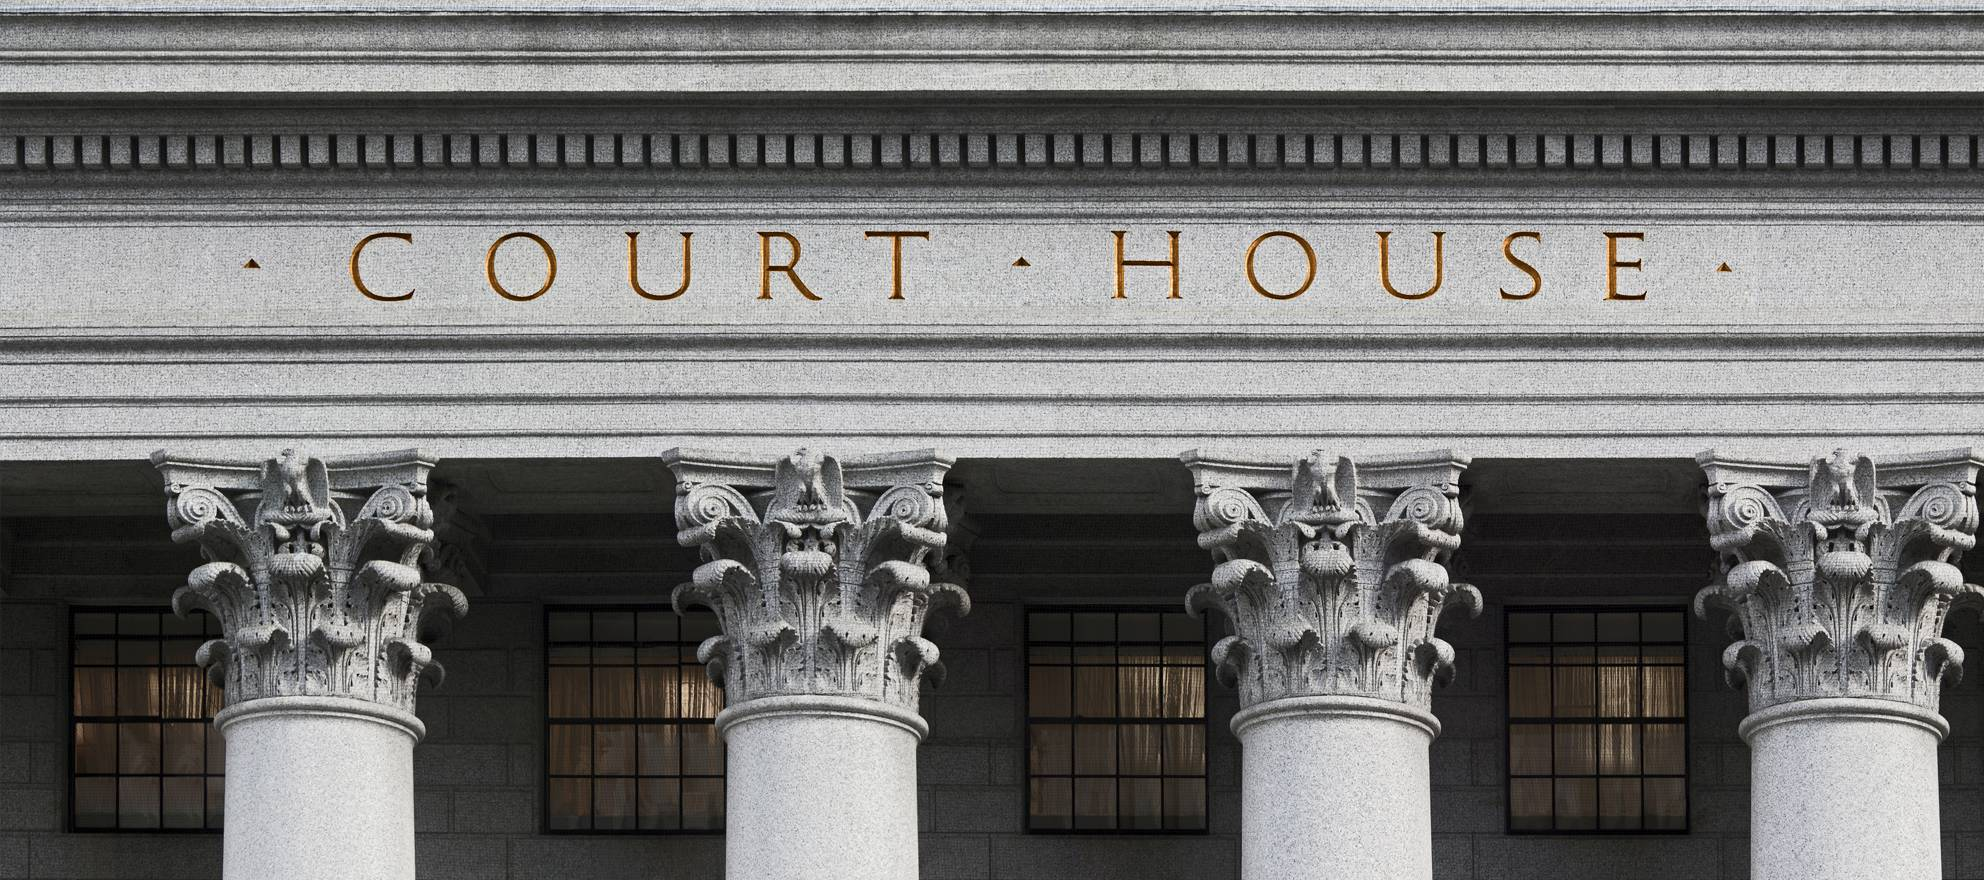 NAR dodges 3 Zillow claims in Crocker letter countersuit, but defamation sticks